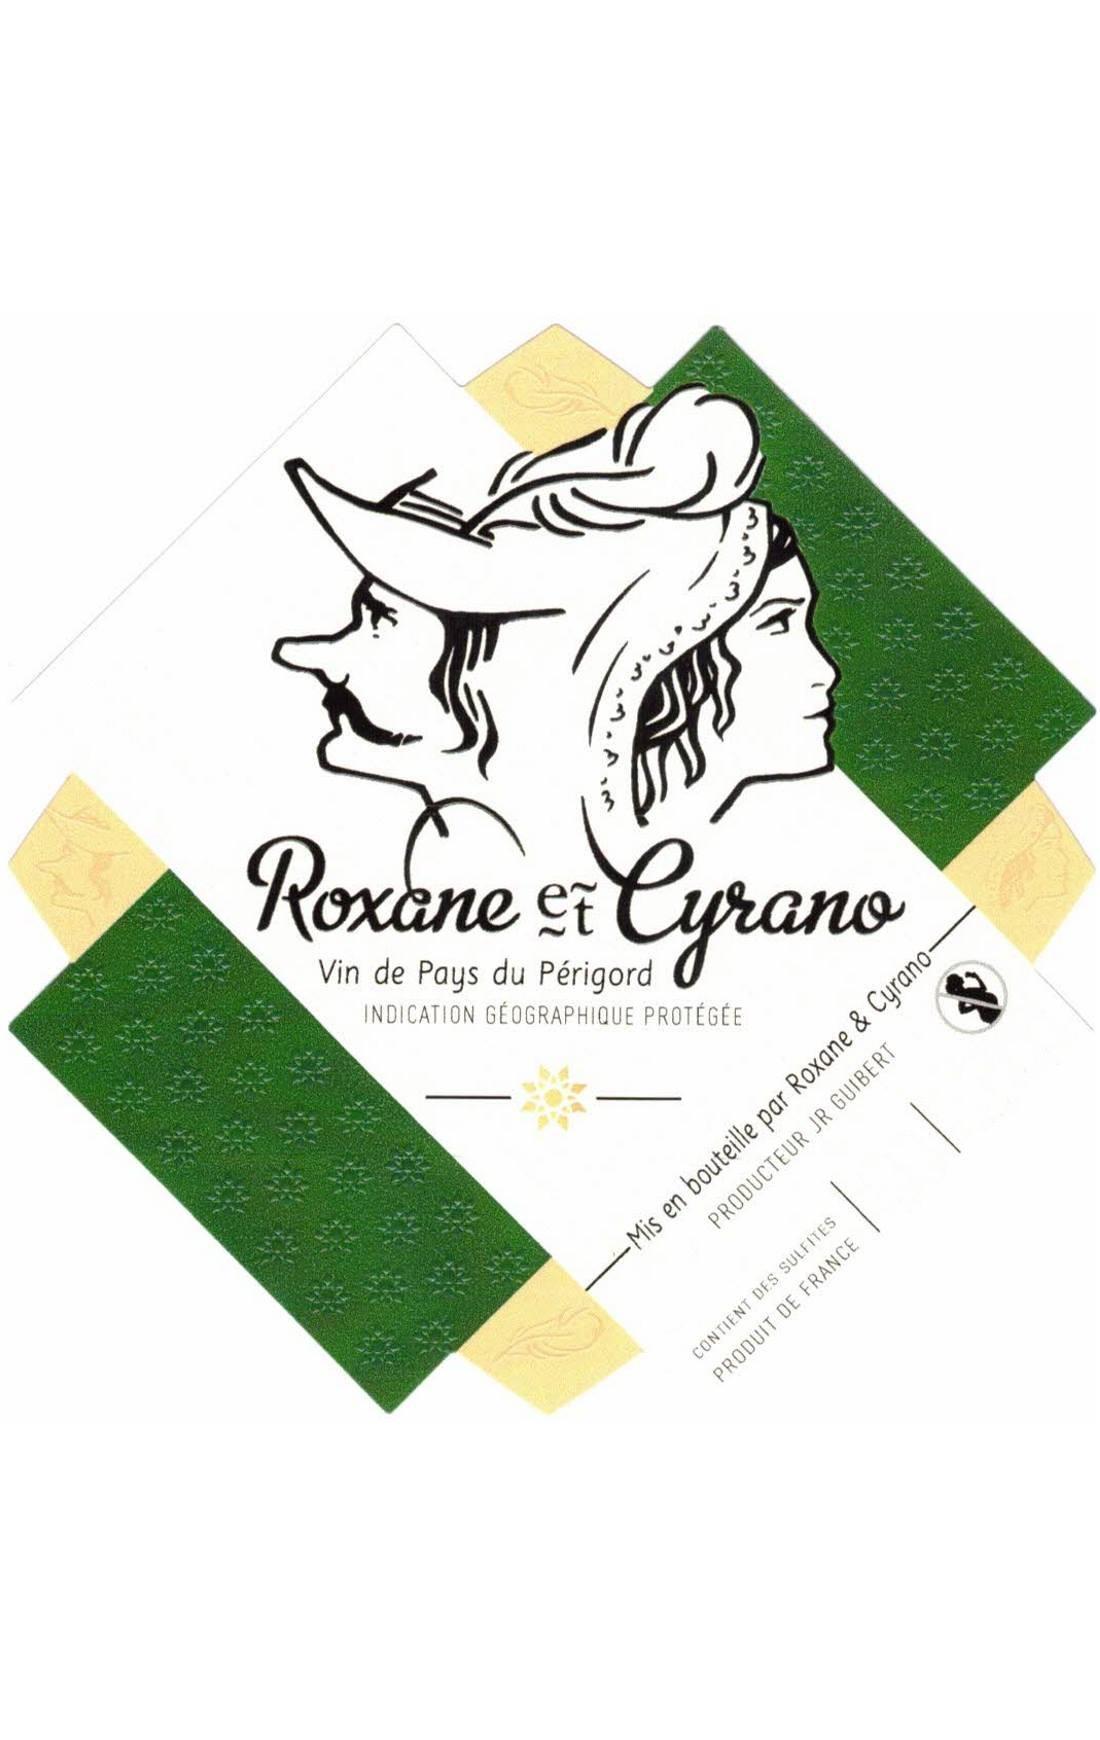 IGP Roxane et Cyrano Blanc Sec